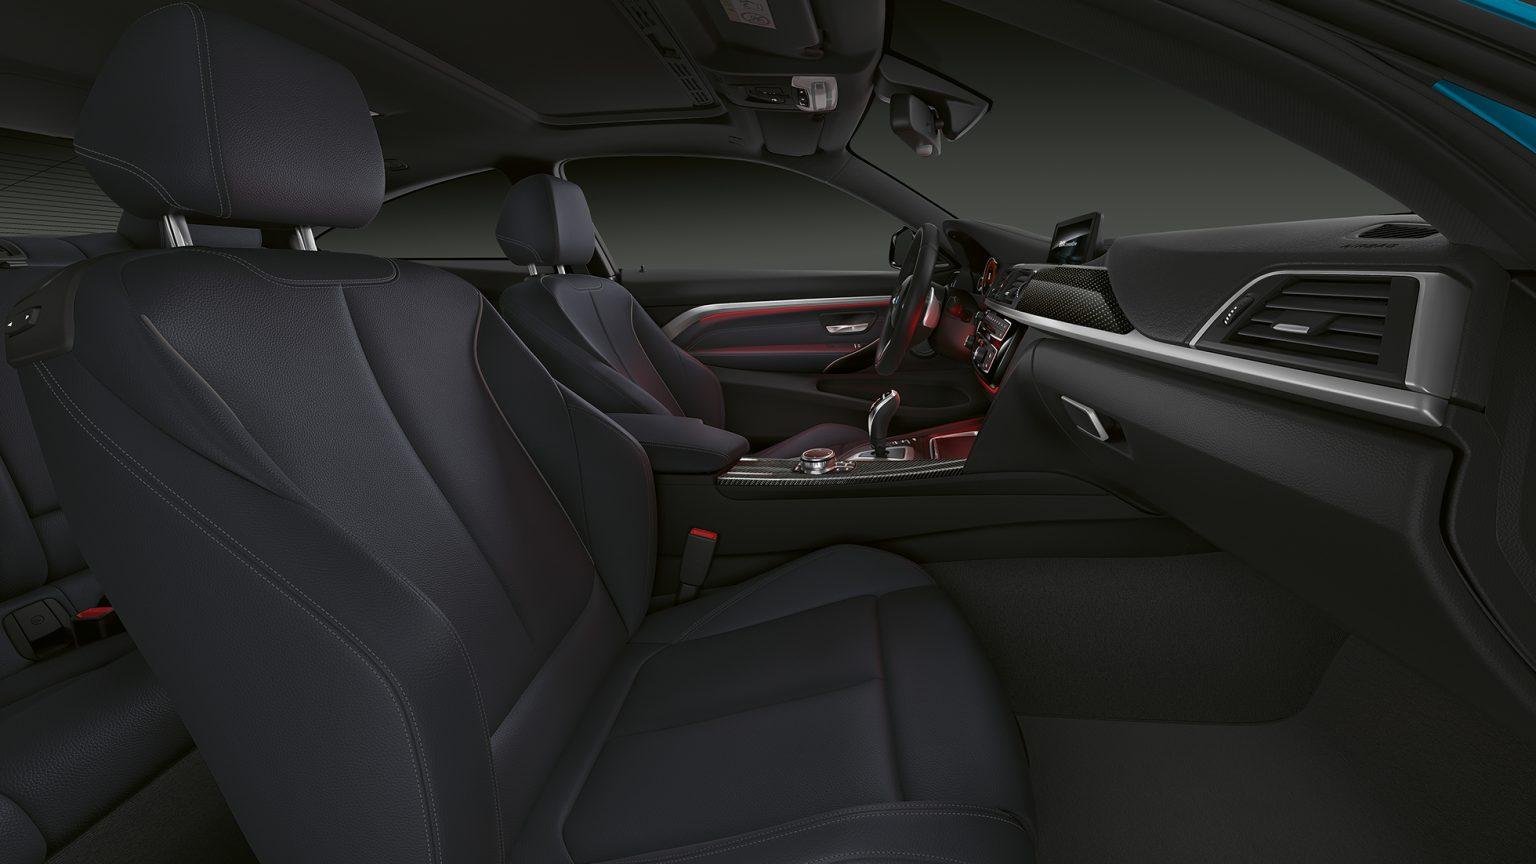 bmw-4-series-coupe-inspire-highlight-desktop-02